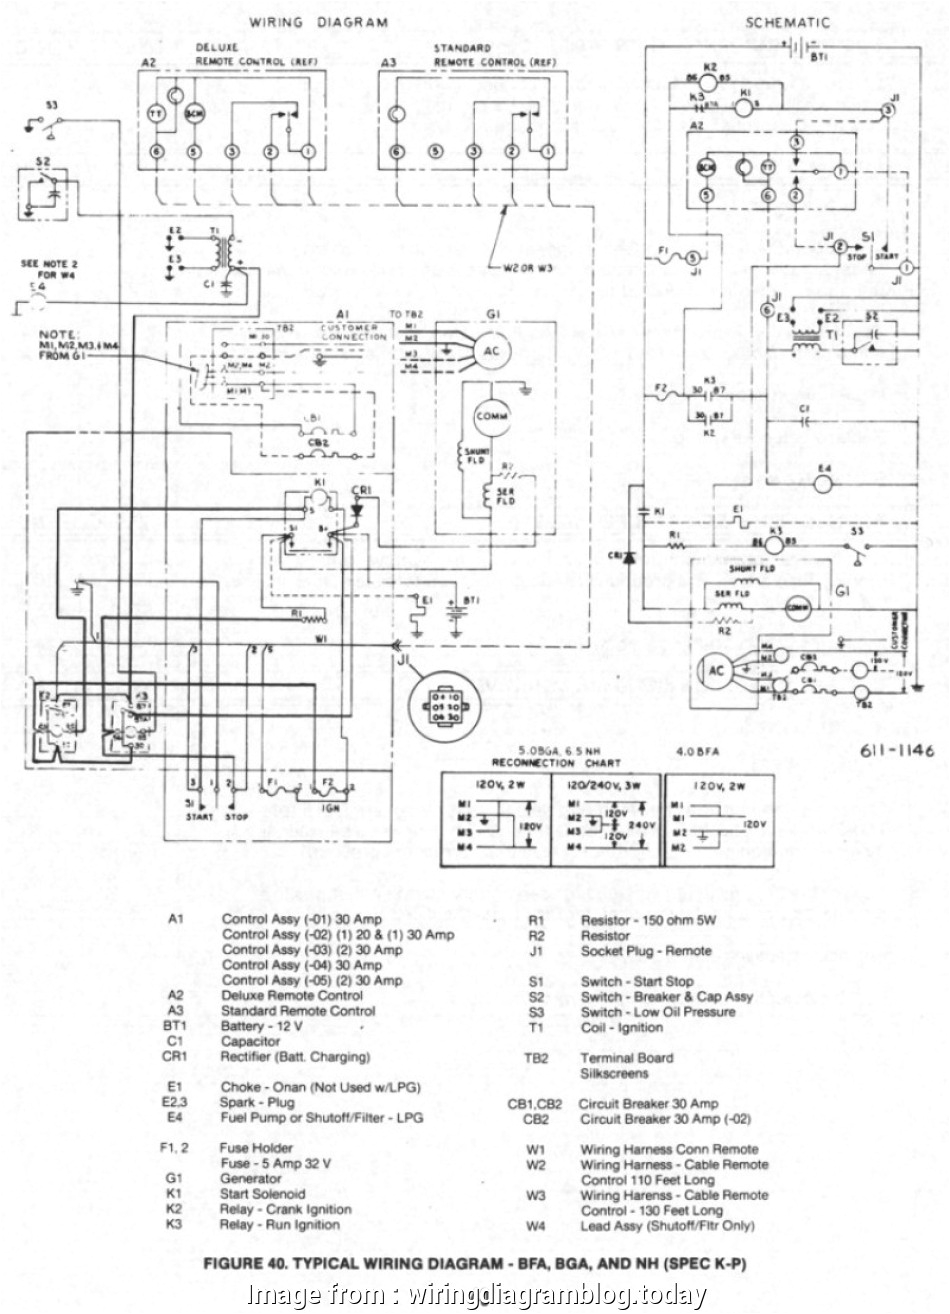 onan starter wiring diagram cummins onan generator wiring diagram wire center u2022 rh epelican co 85 47458 jpg